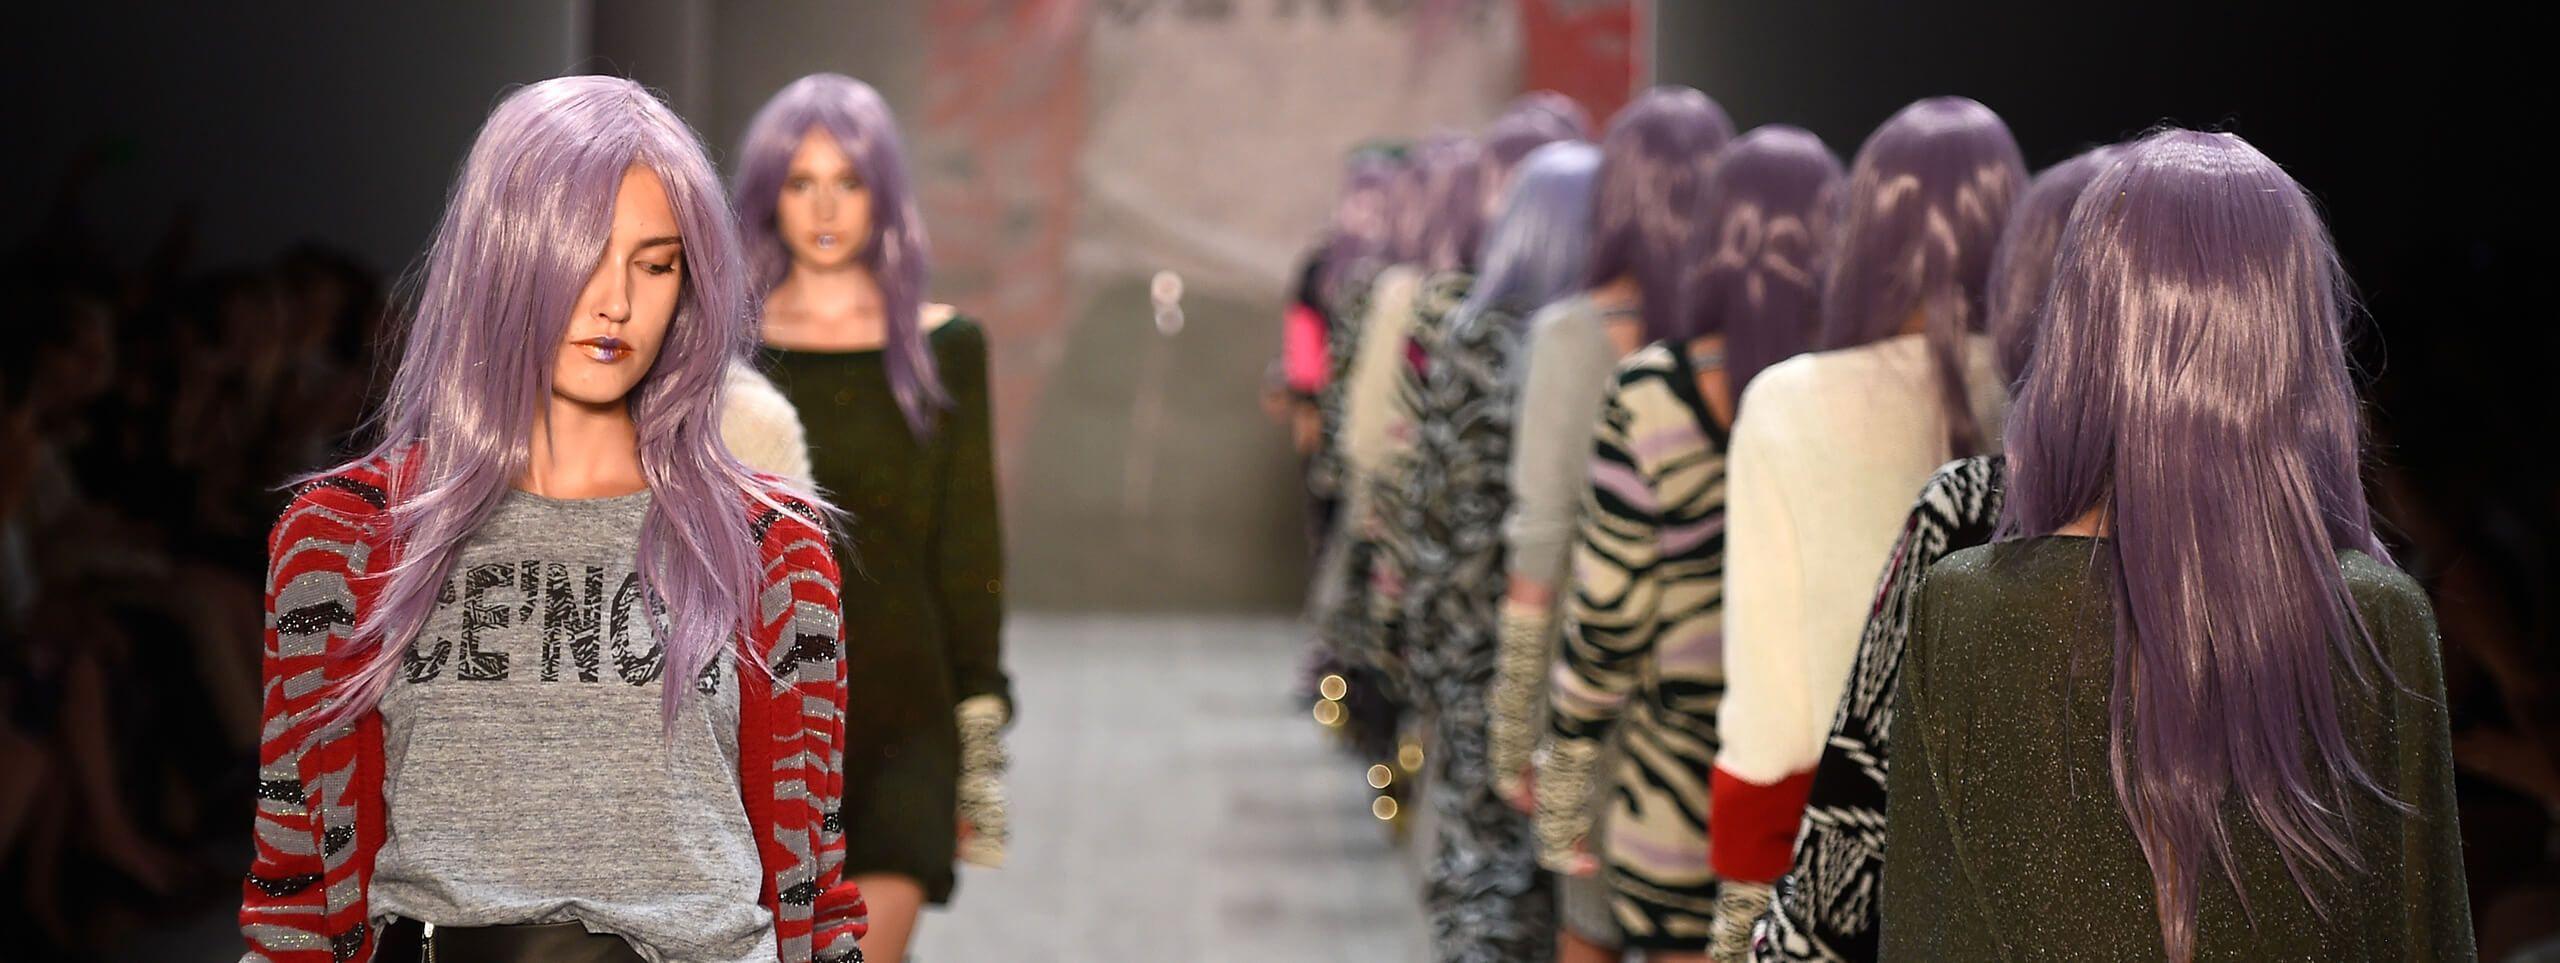 Modelos pasarela con color fantasía de pelo morado